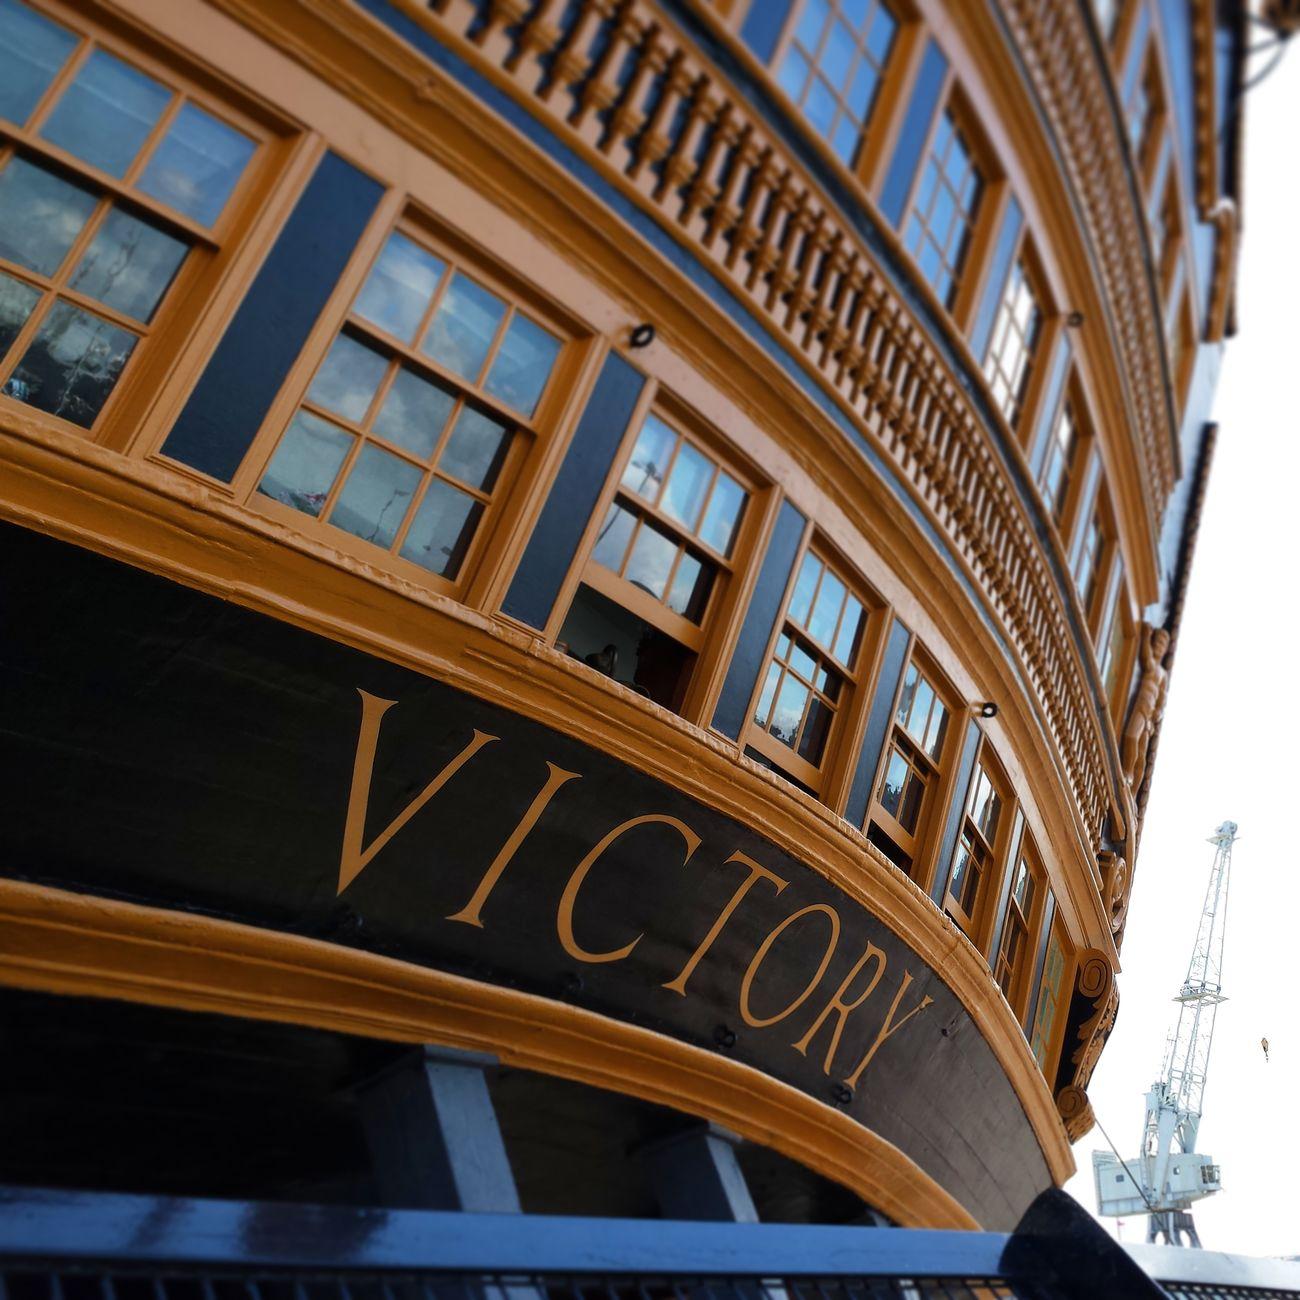 Historical Landmarks History Through The Lens  Shiplife Shipyard Ships History Portsmouth Historic Dockyard Portsmouth Outdoors Close-up